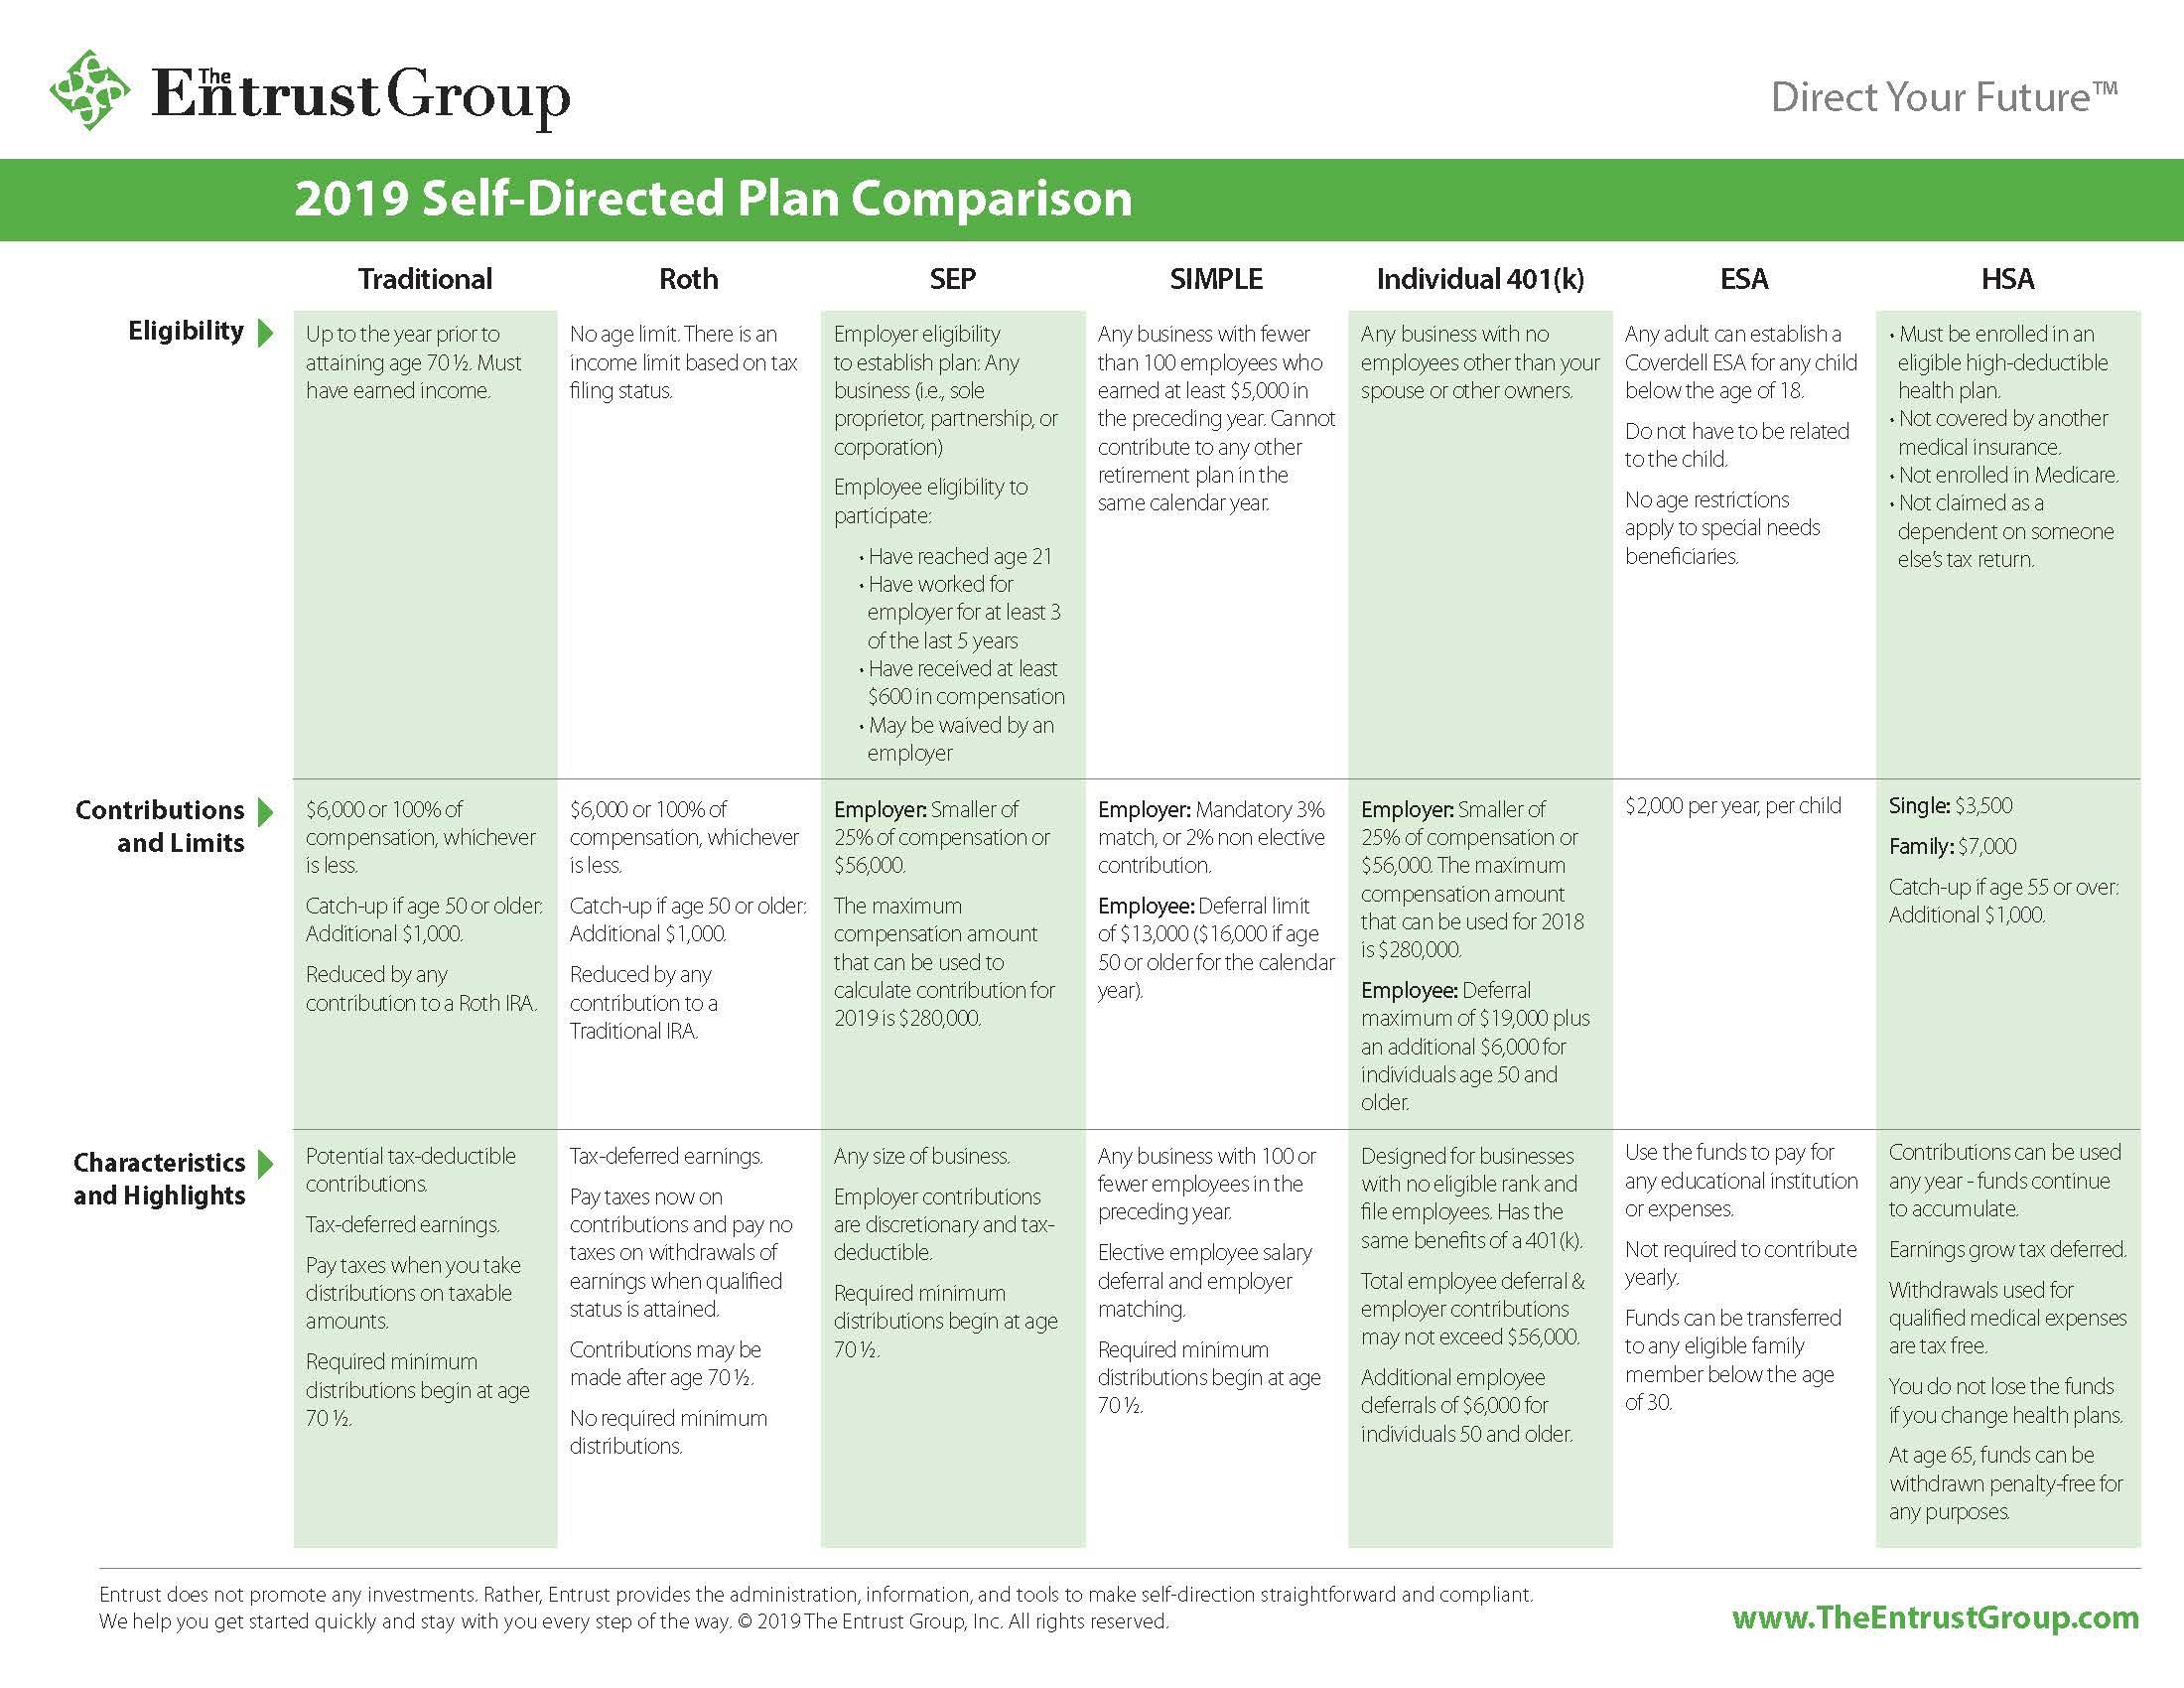 2018-Self-Directed-Plan-Comparison-image